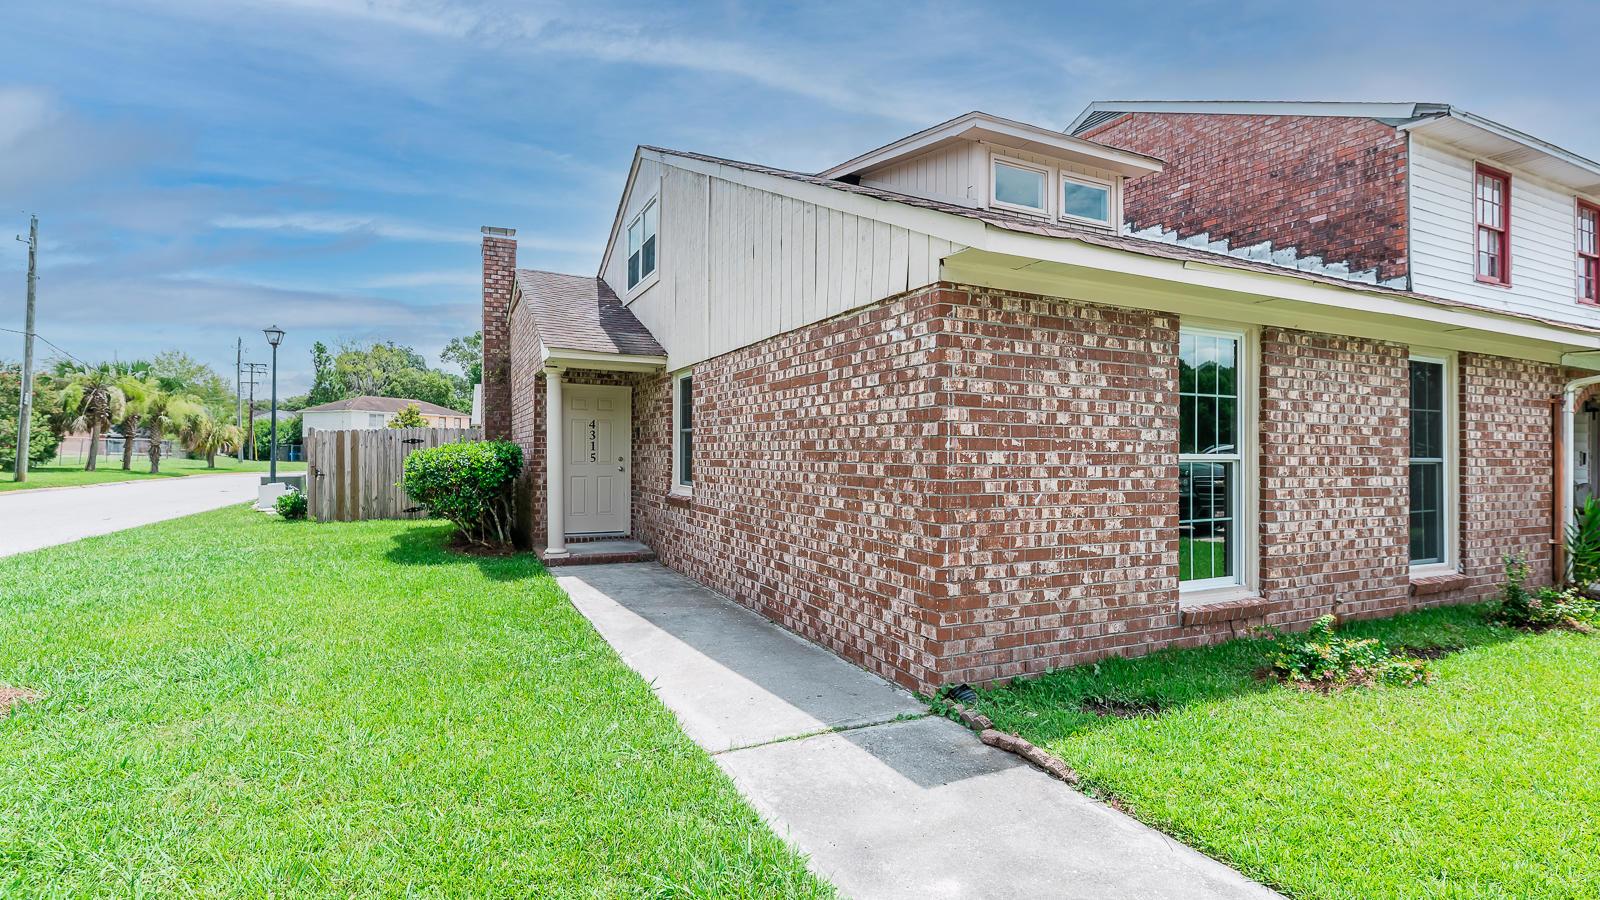 Ashley Villas Homes For Sale - 4315 Briarstone, North Charleston, SC - 6